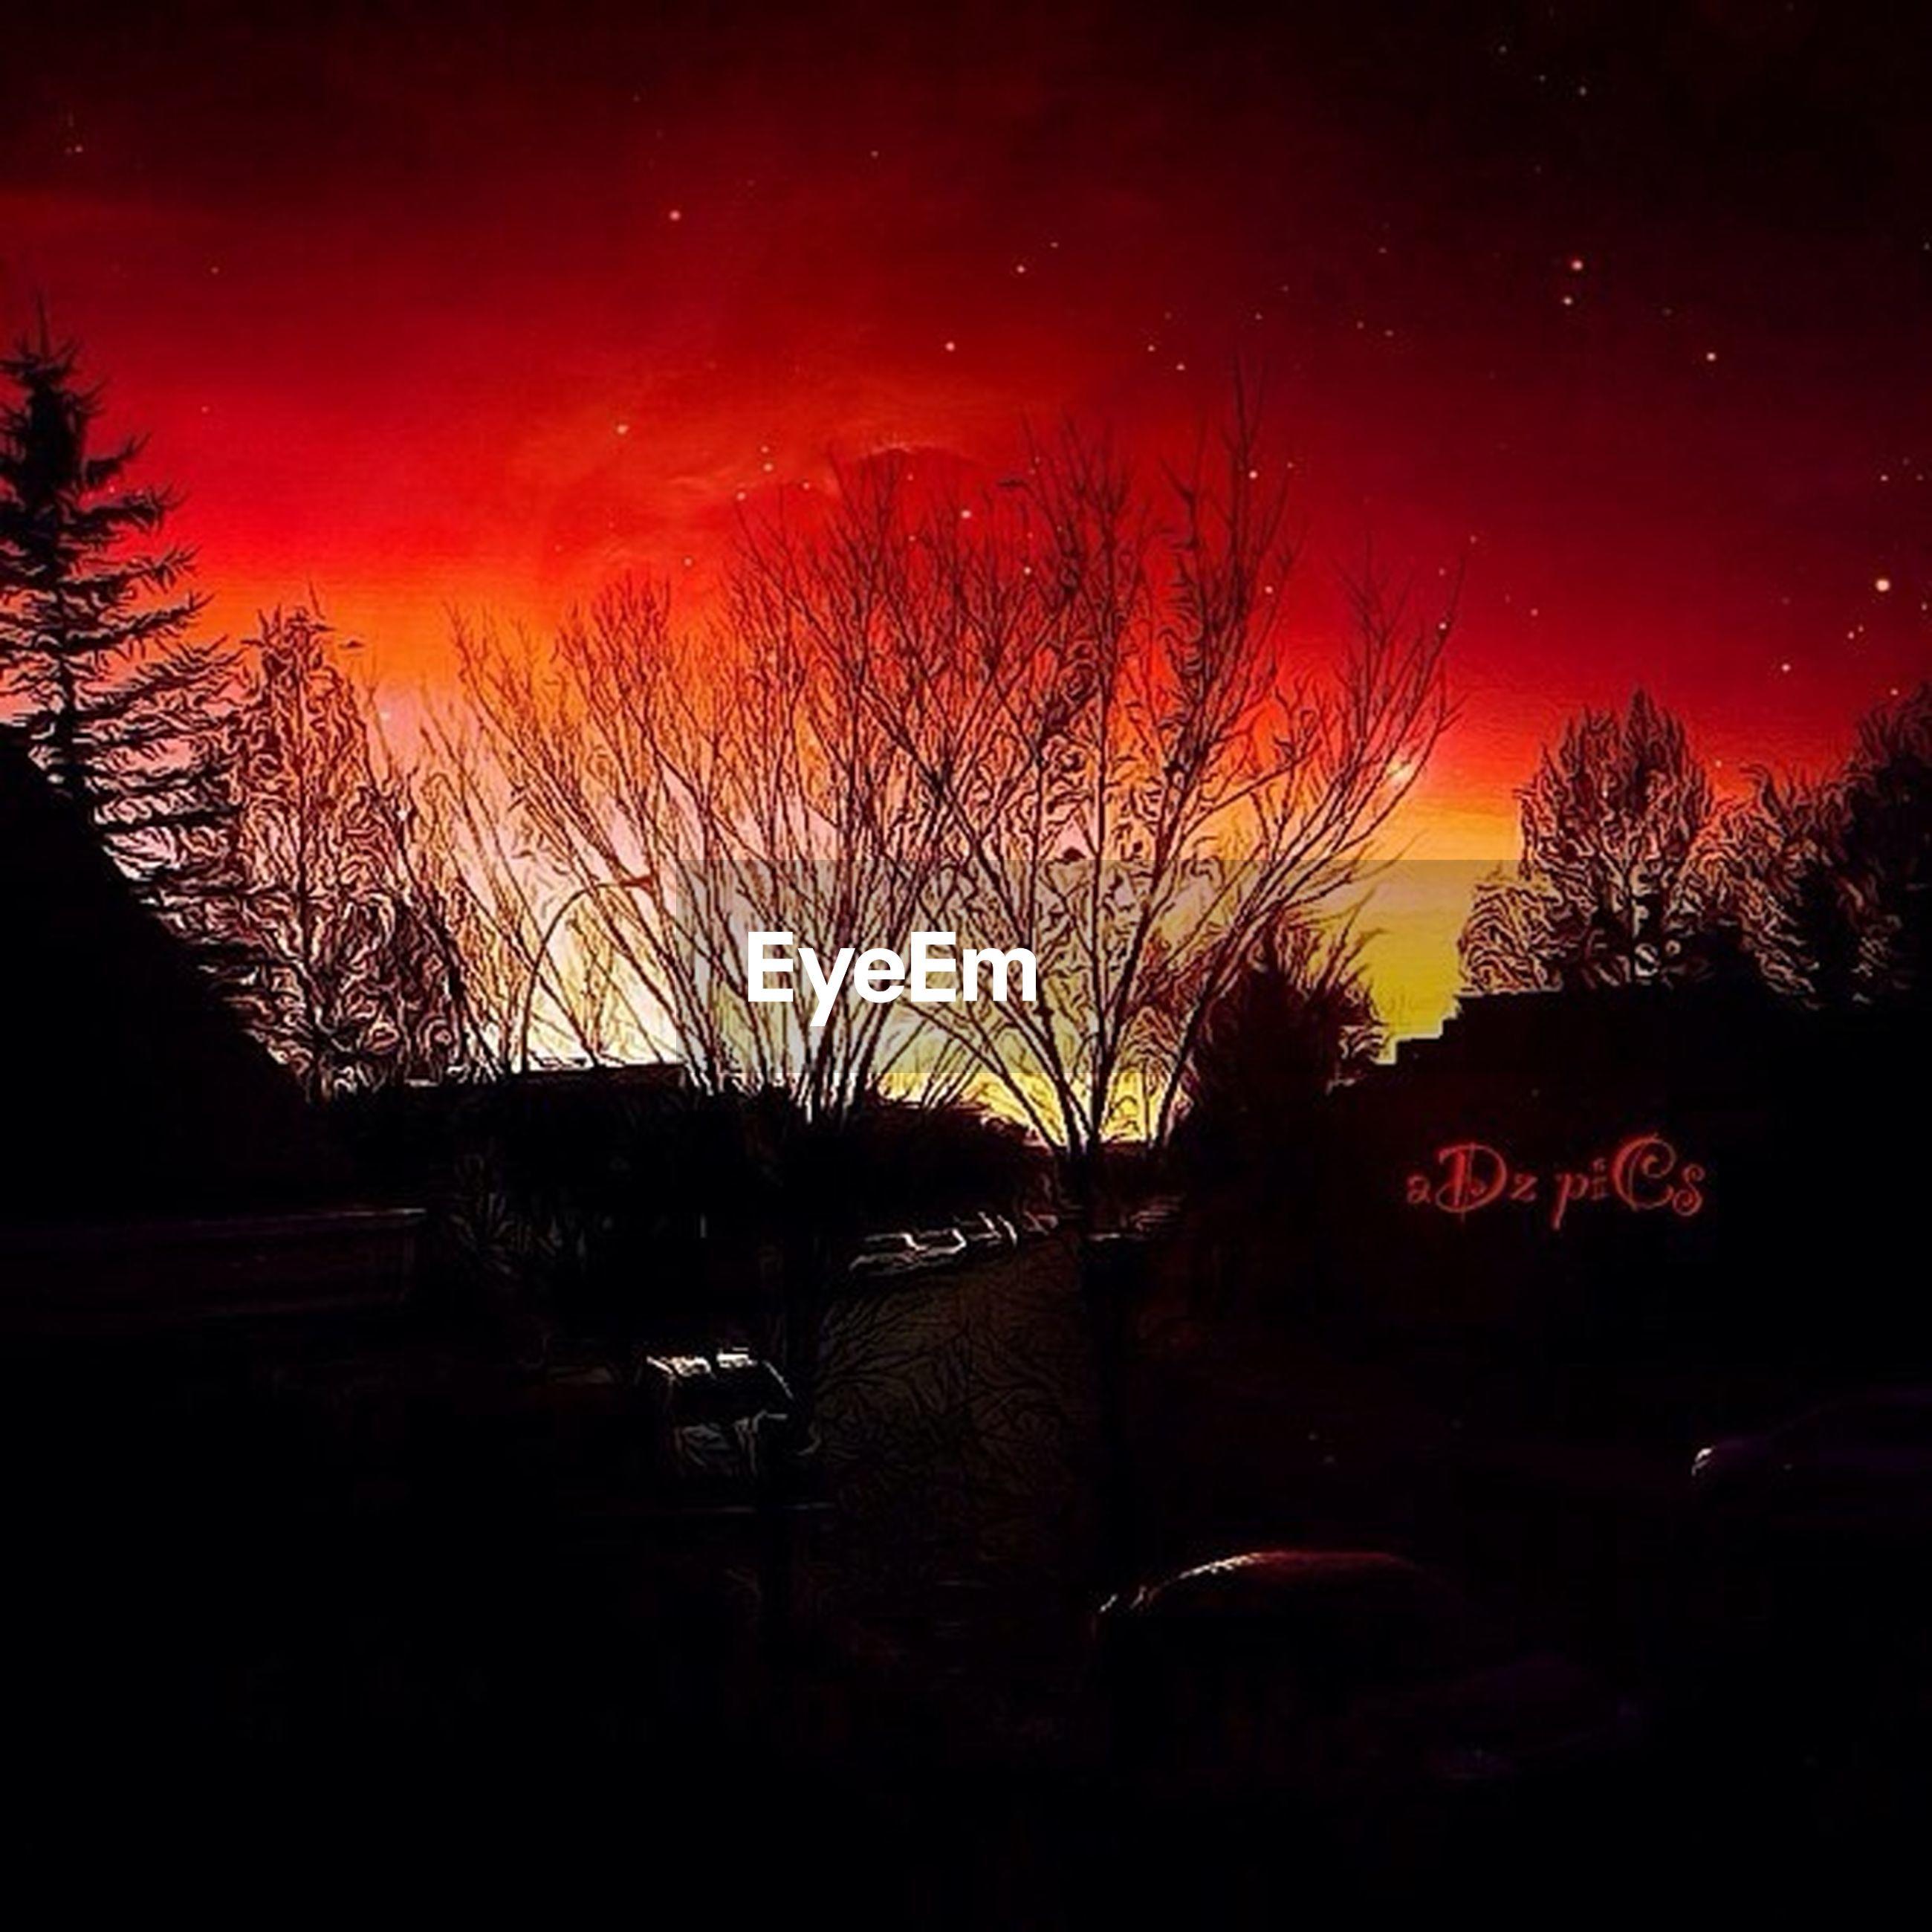 sunset, silhouette, sky, tree, orange color, night, bare tree, scenics, illuminated, dark, tranquility, tranquil scene, beauty in nature, nature, dusk, idyllic, dramatic sky, outdoors, no people, branch